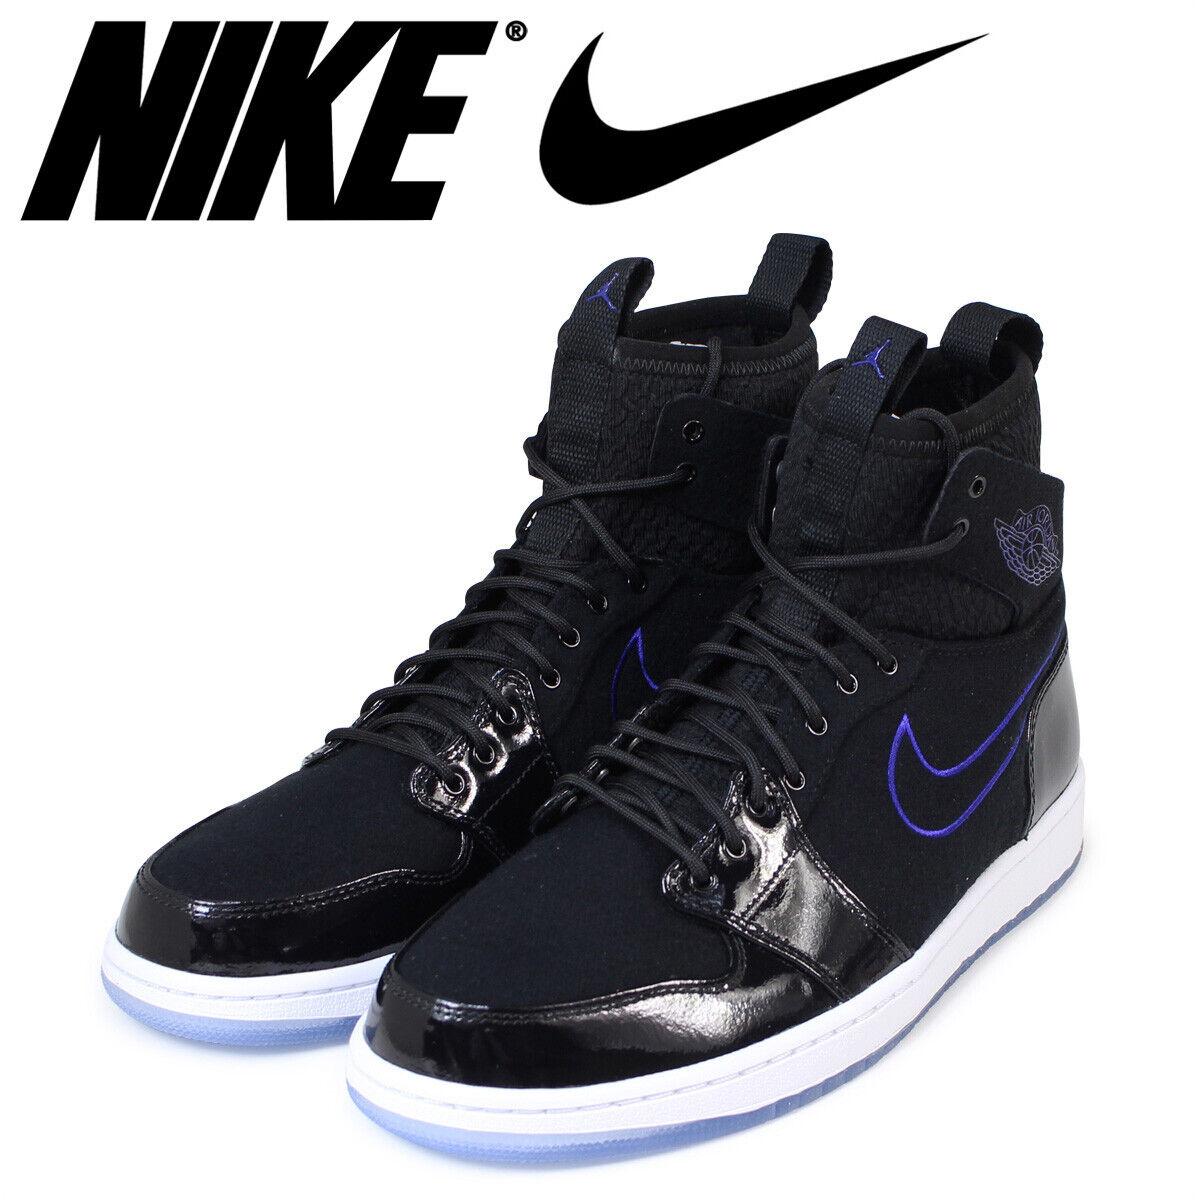 finest selection 37f40 1fe25 SZ 10 10 10 Nike Jordan 1 Retro Ultra High Space Jam Black Concord Sneakers  844700